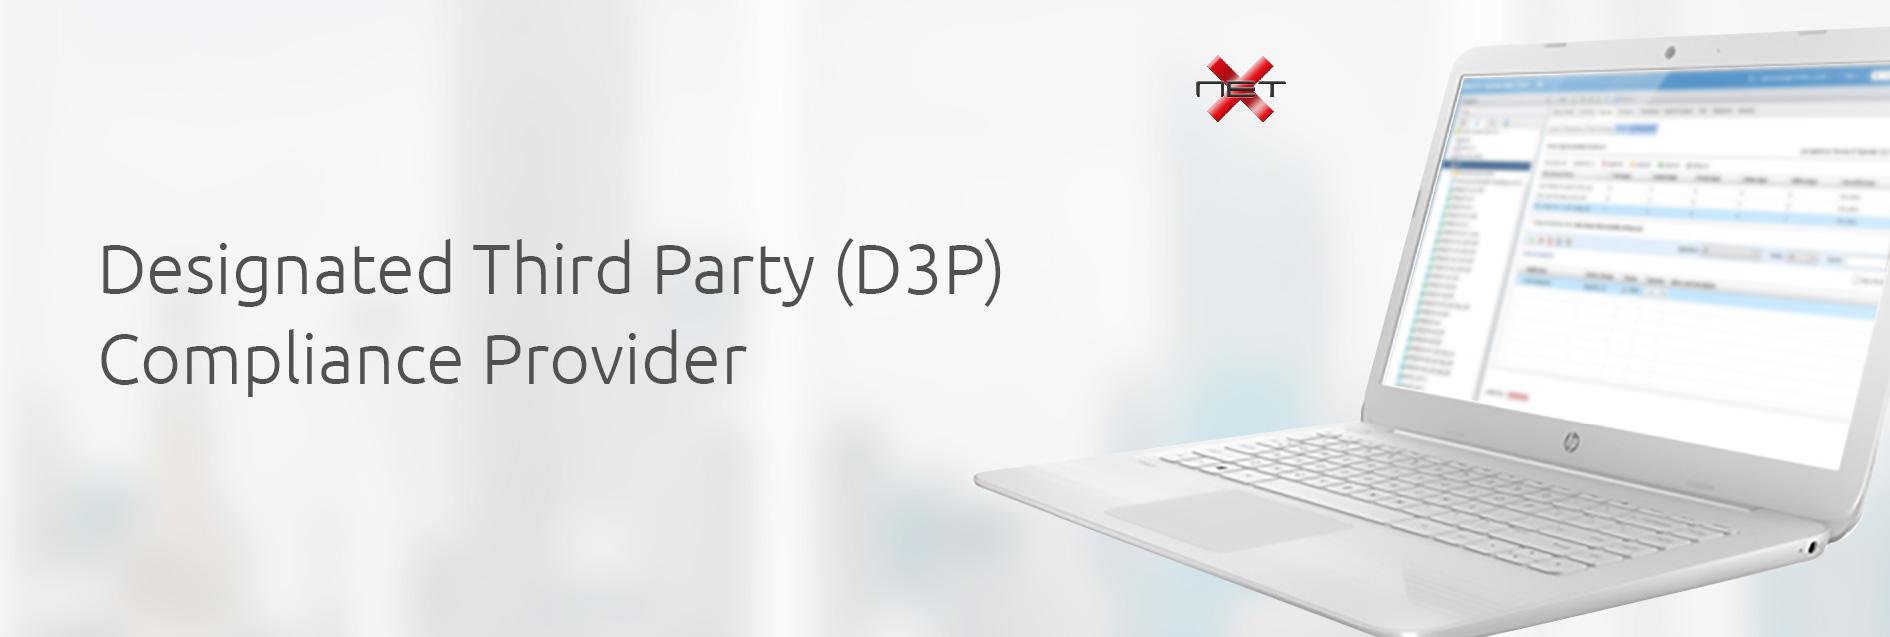 netx-symantec-Designated-Third-Party-compliance-provider-banner